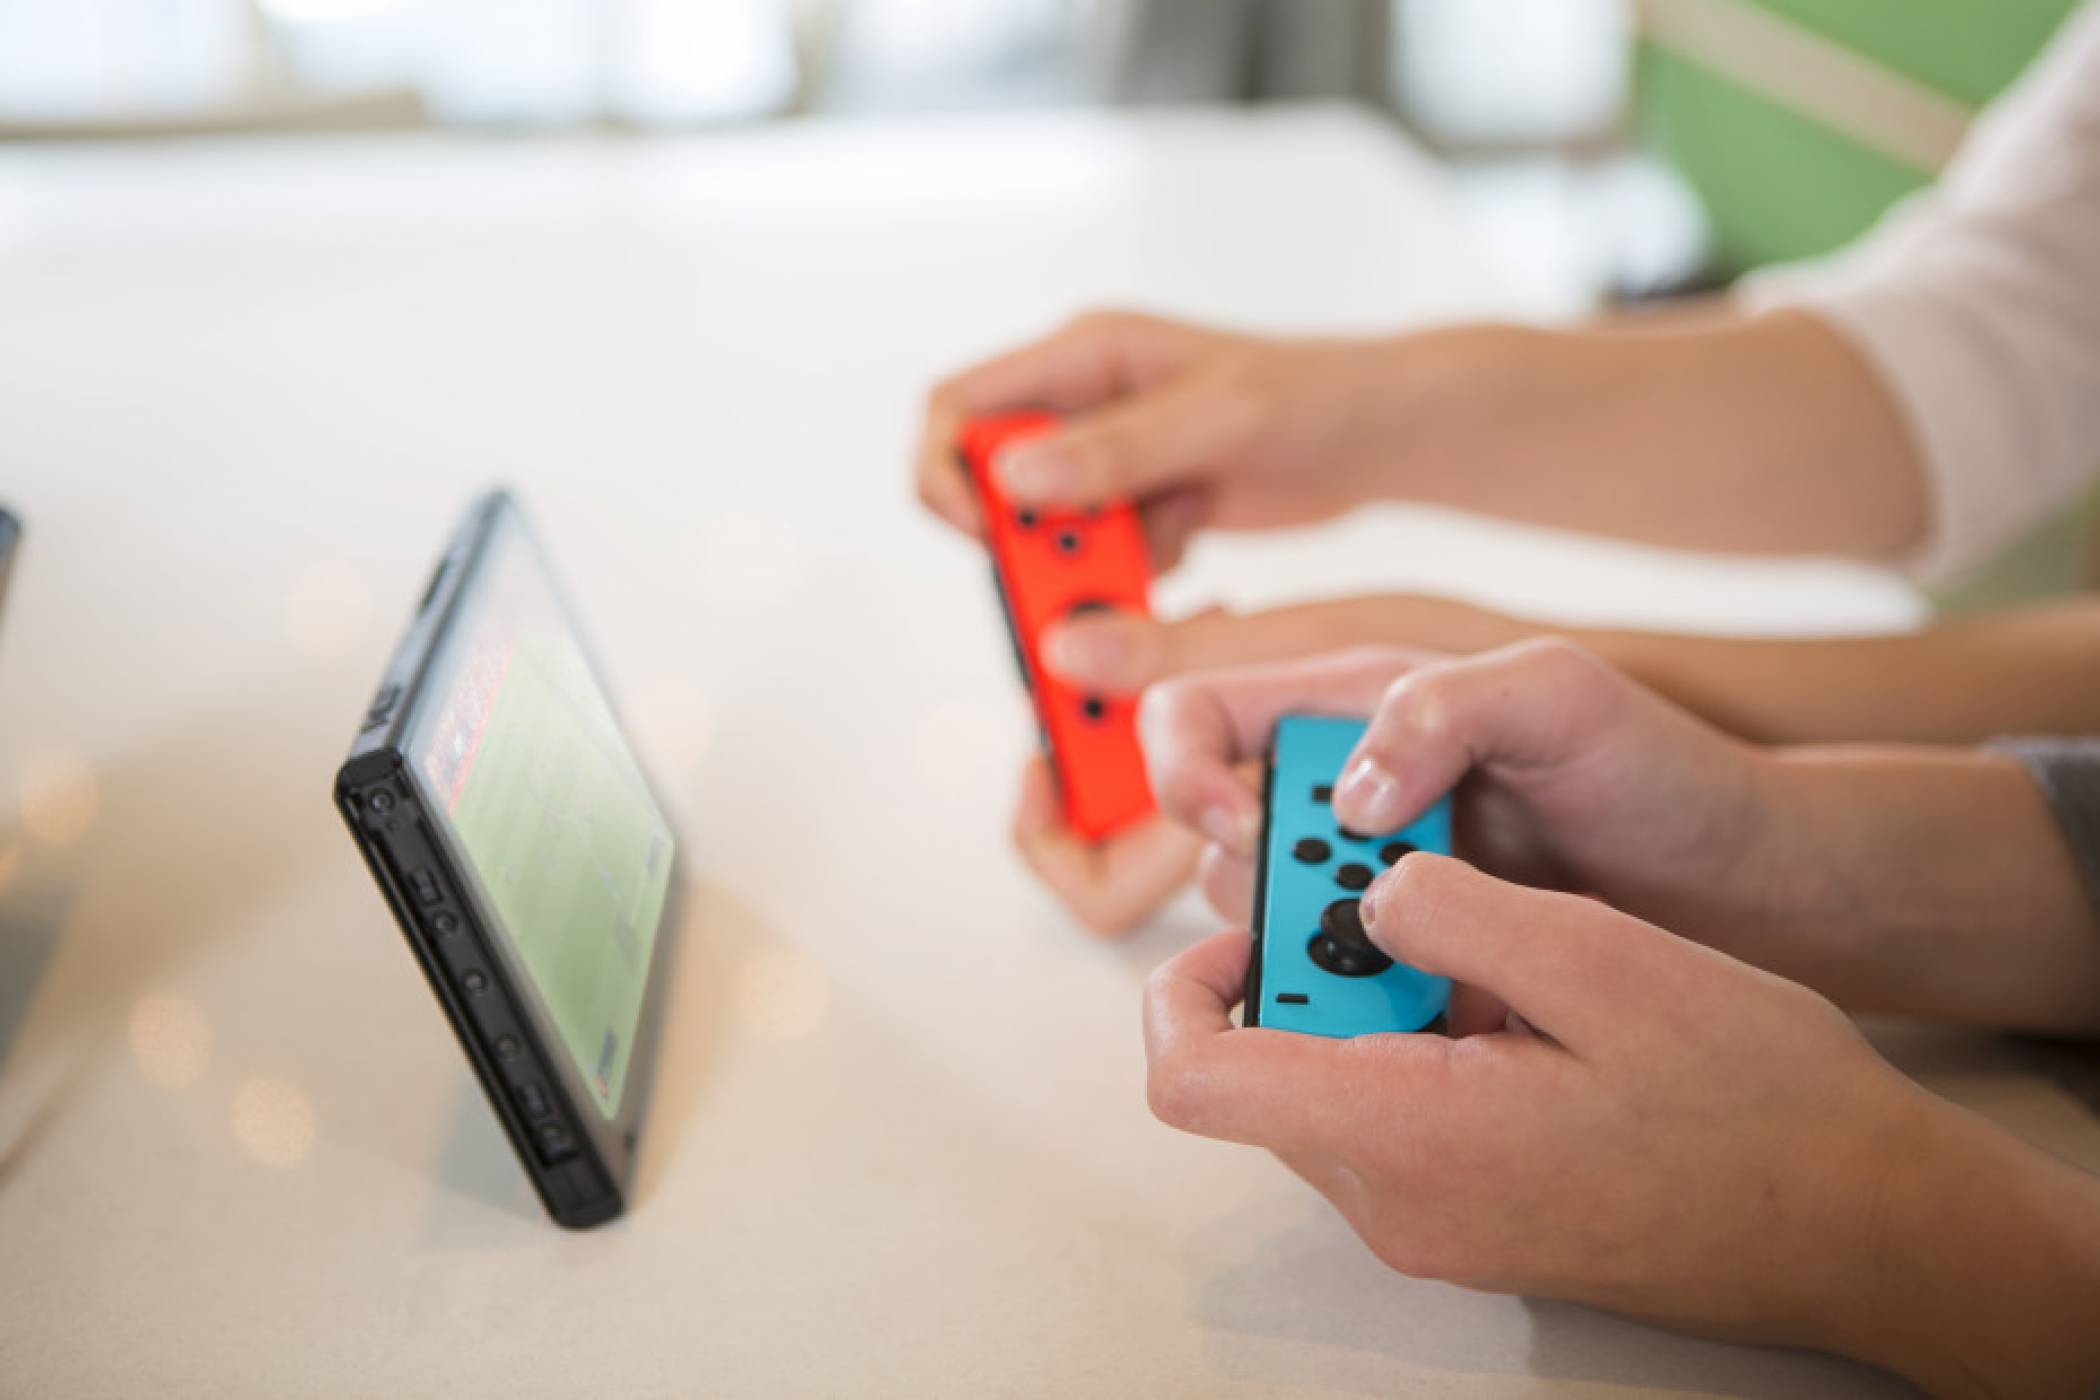 Metroid Prime 4, Pokemon RPG, Yoshi и Kirby ще пропуснат Switch тази година